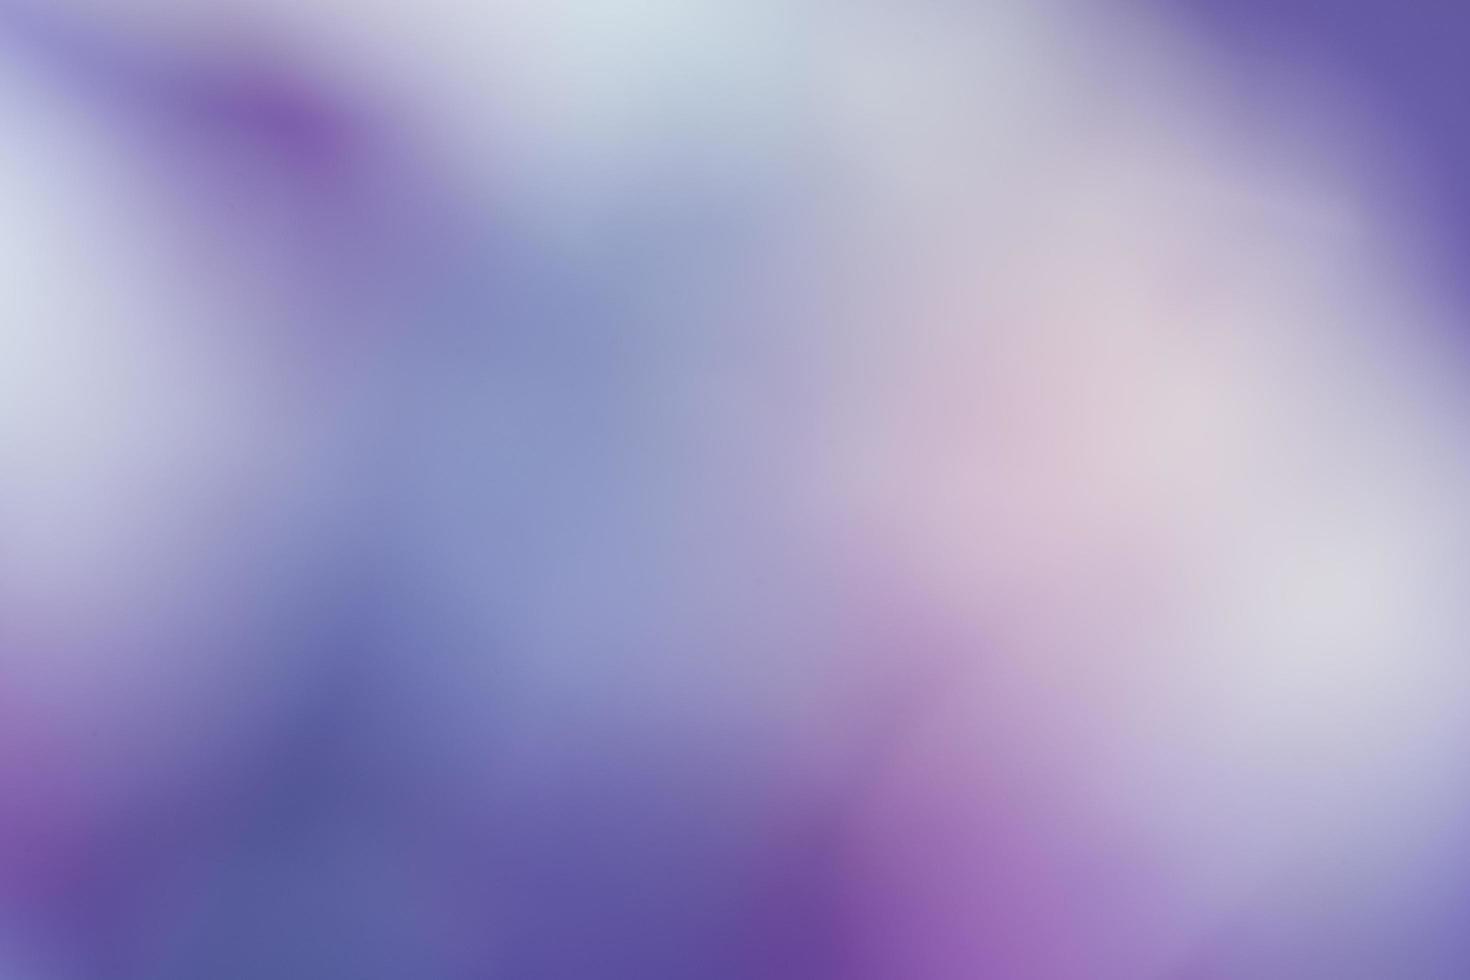 fondo colorido bokeh foto